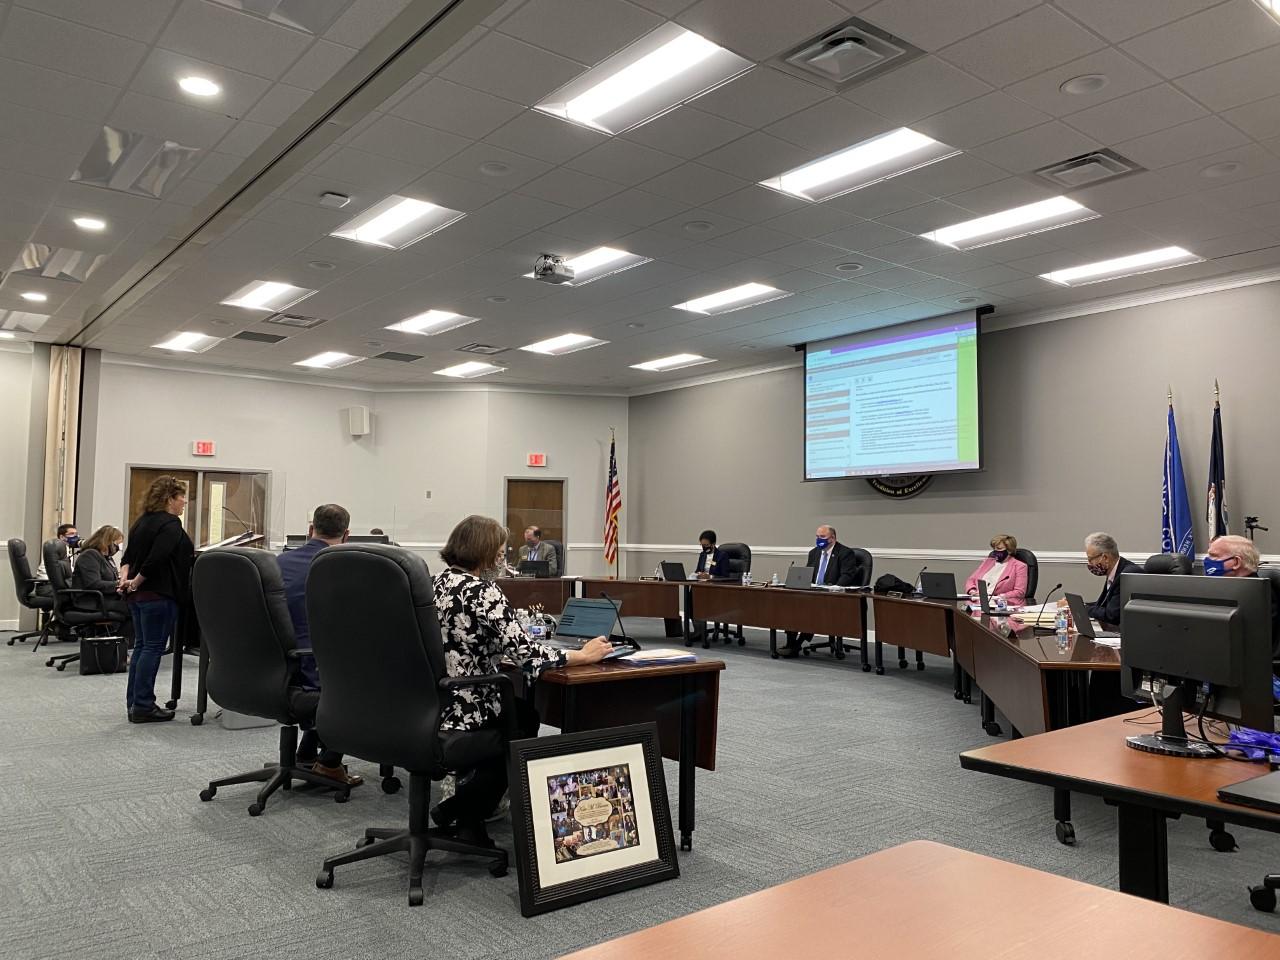 Hanover County School Board meeting